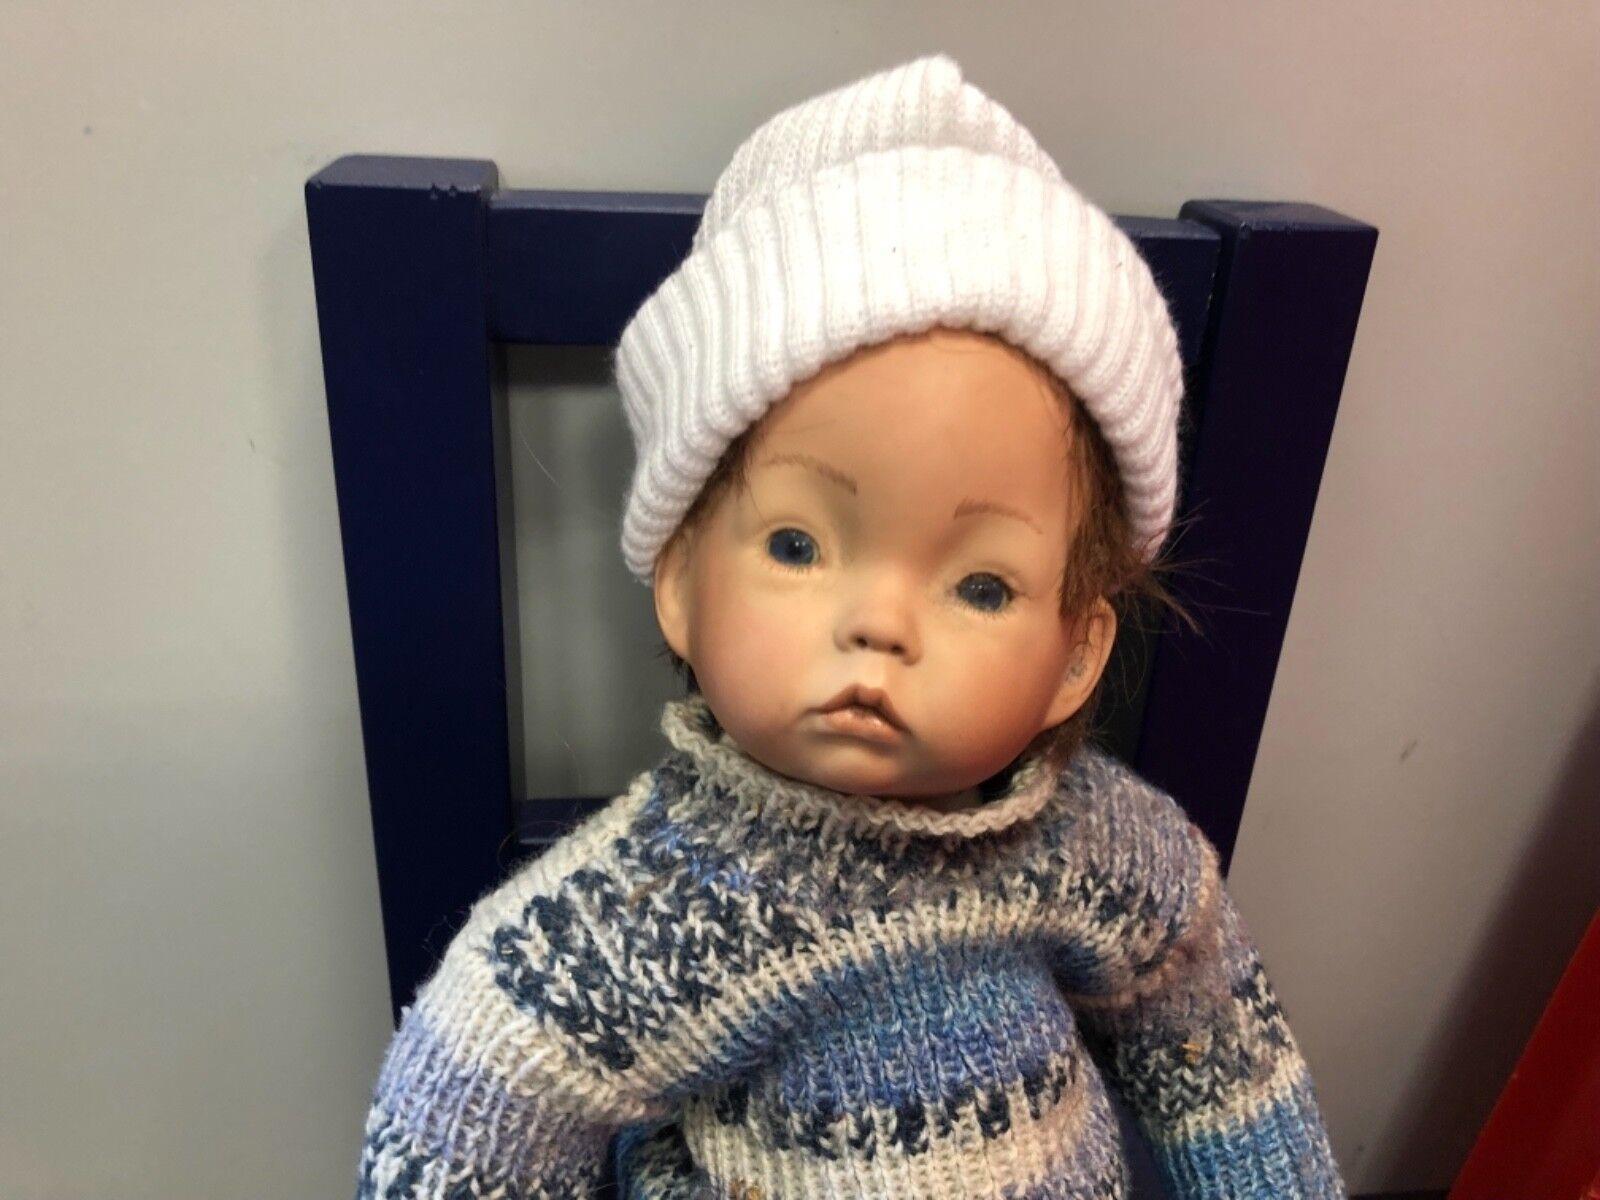 Puppe Aus Voll-porzellan! KÜnstlerpuppe Junge Titus Tomescu: Porzellanpuppe